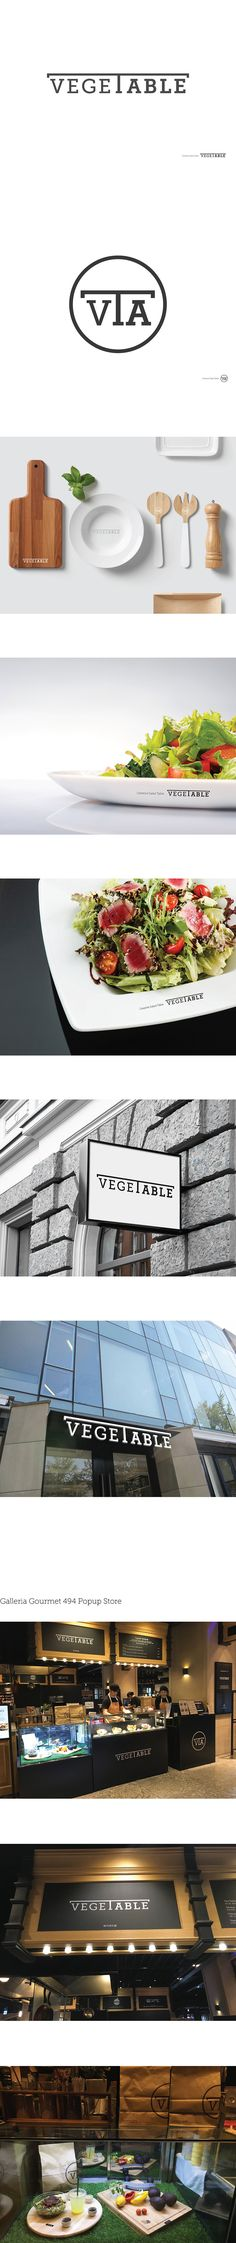 VEGE TABLE_Salad Shop Branding Design  Year : 2015 (5일 소요)  본인 참여도 : Branding Design(100%)